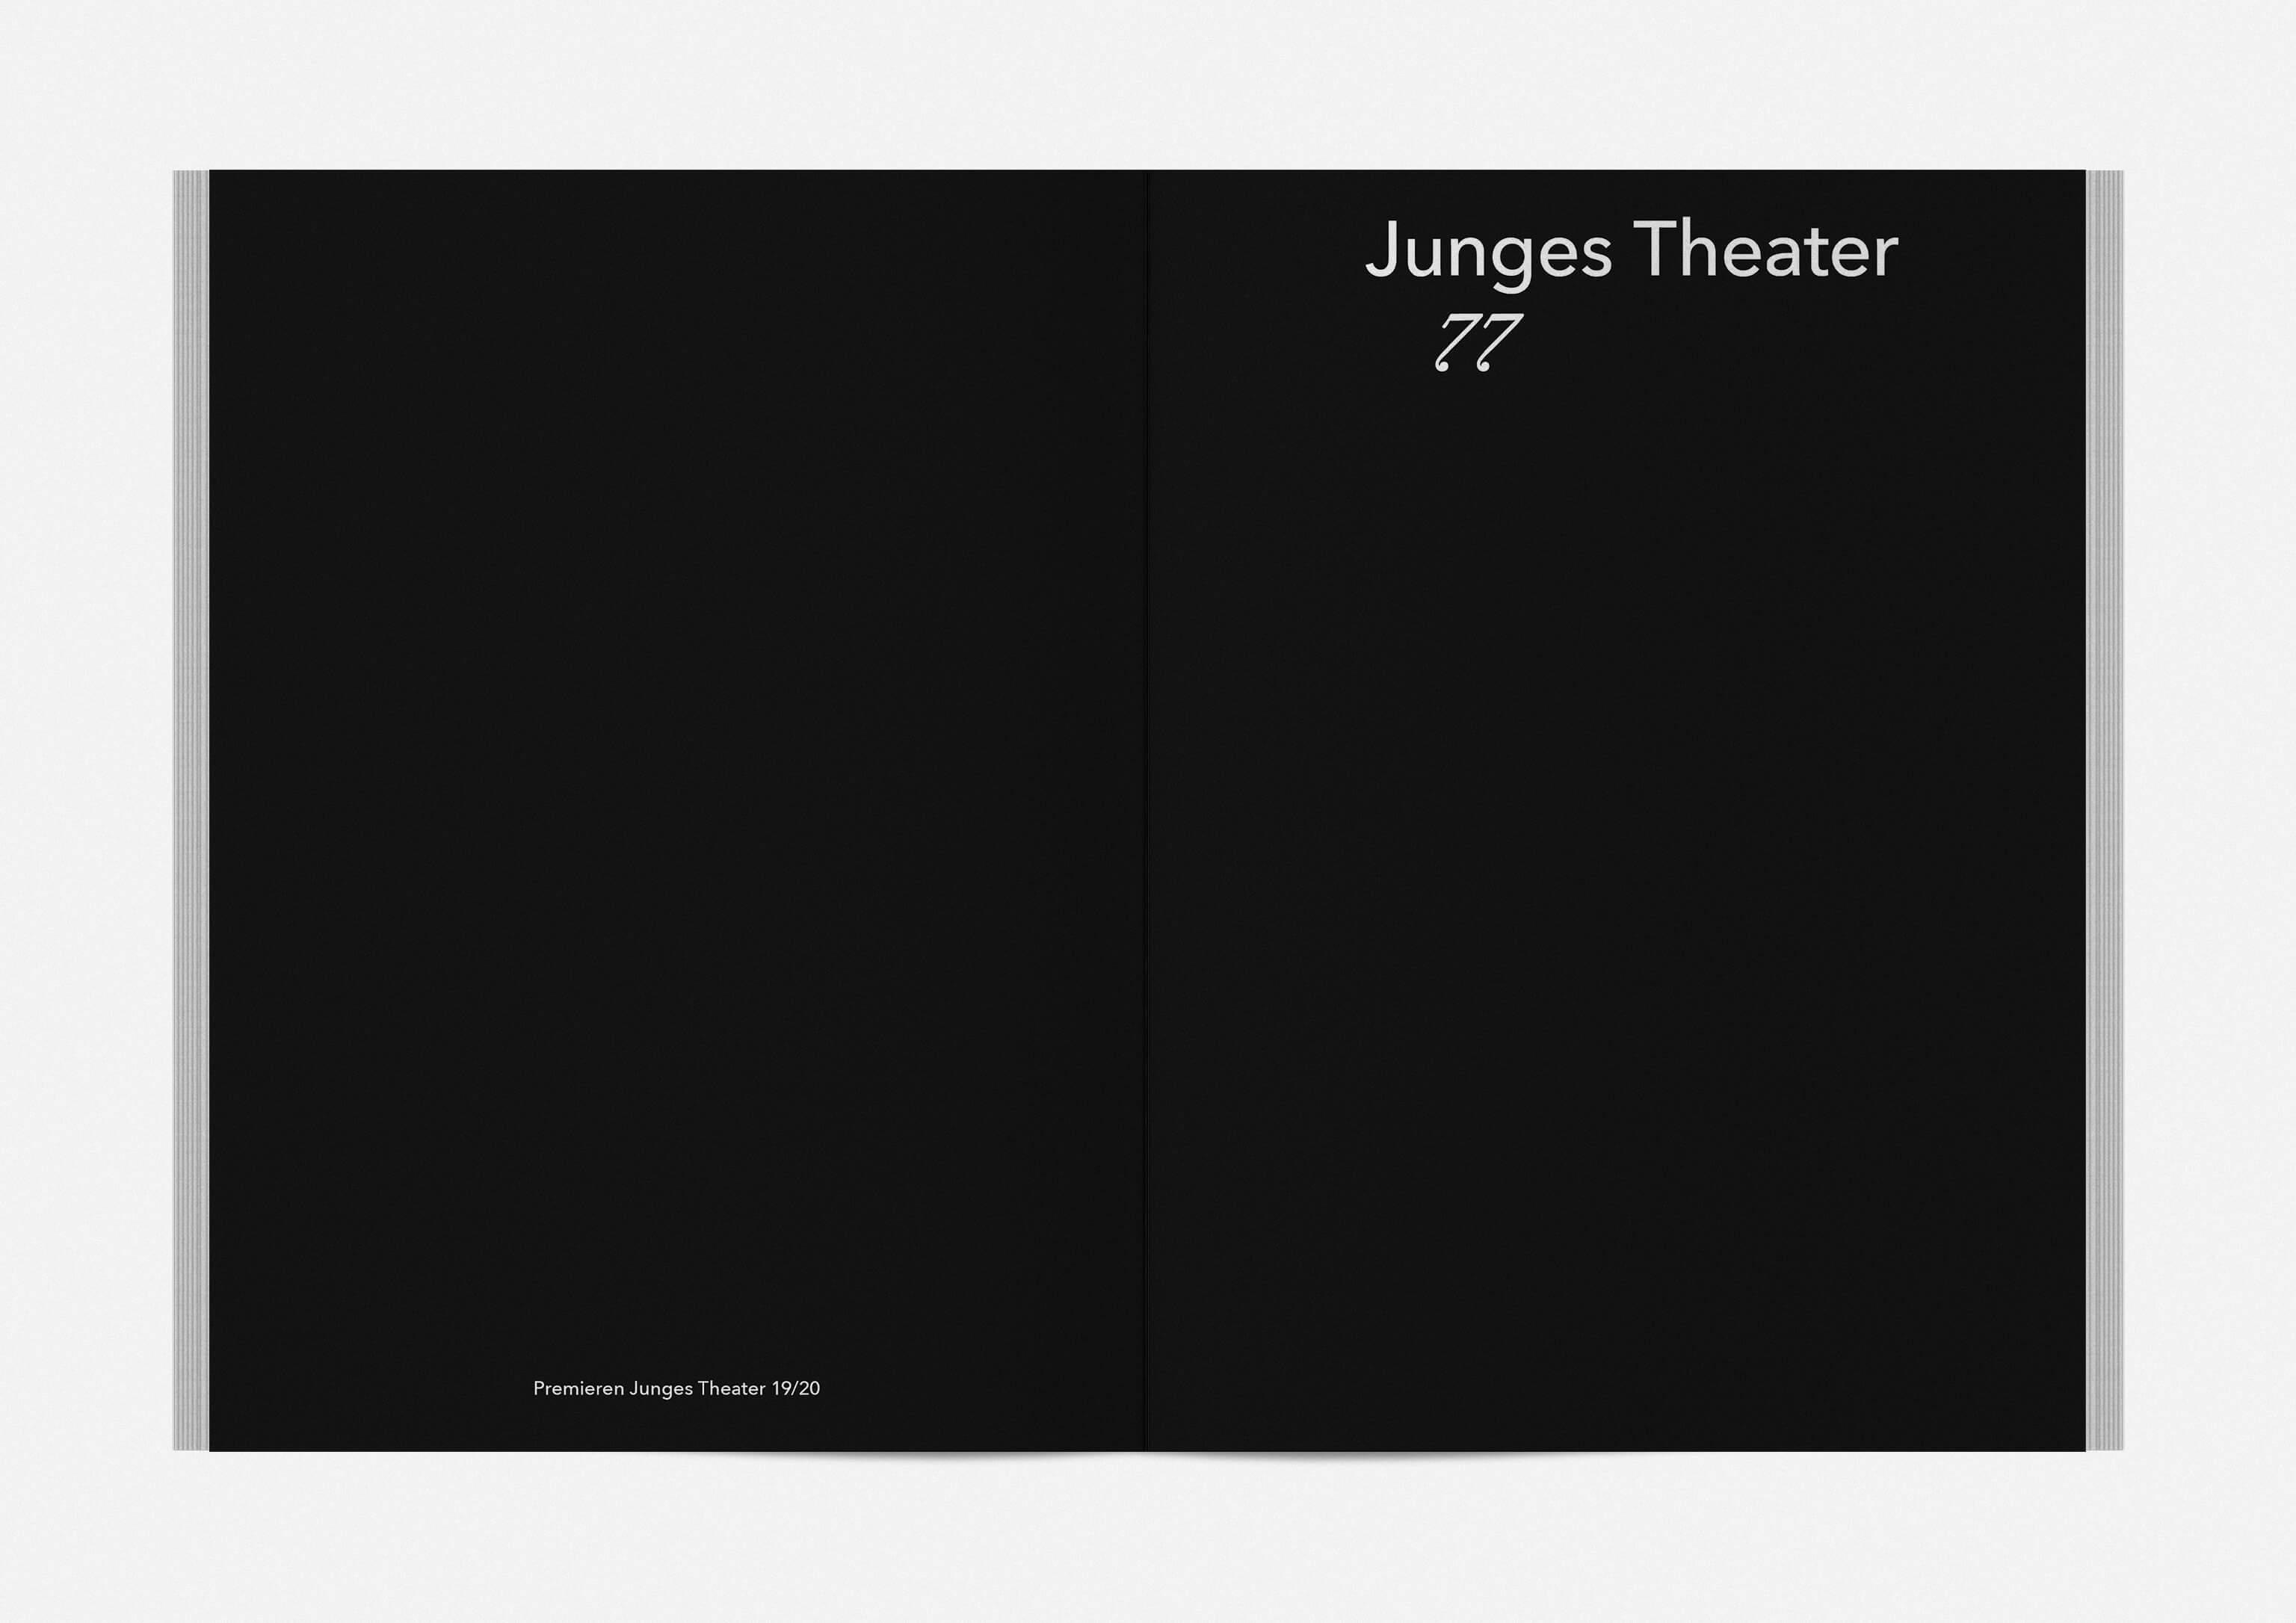 https://neuegestaltung.de/media/pages/clients/theater-erlangen-season-program-19-20/21f401d4b9-1597415332/te_szh_19_20_innenseite_76_77_ng.jpg